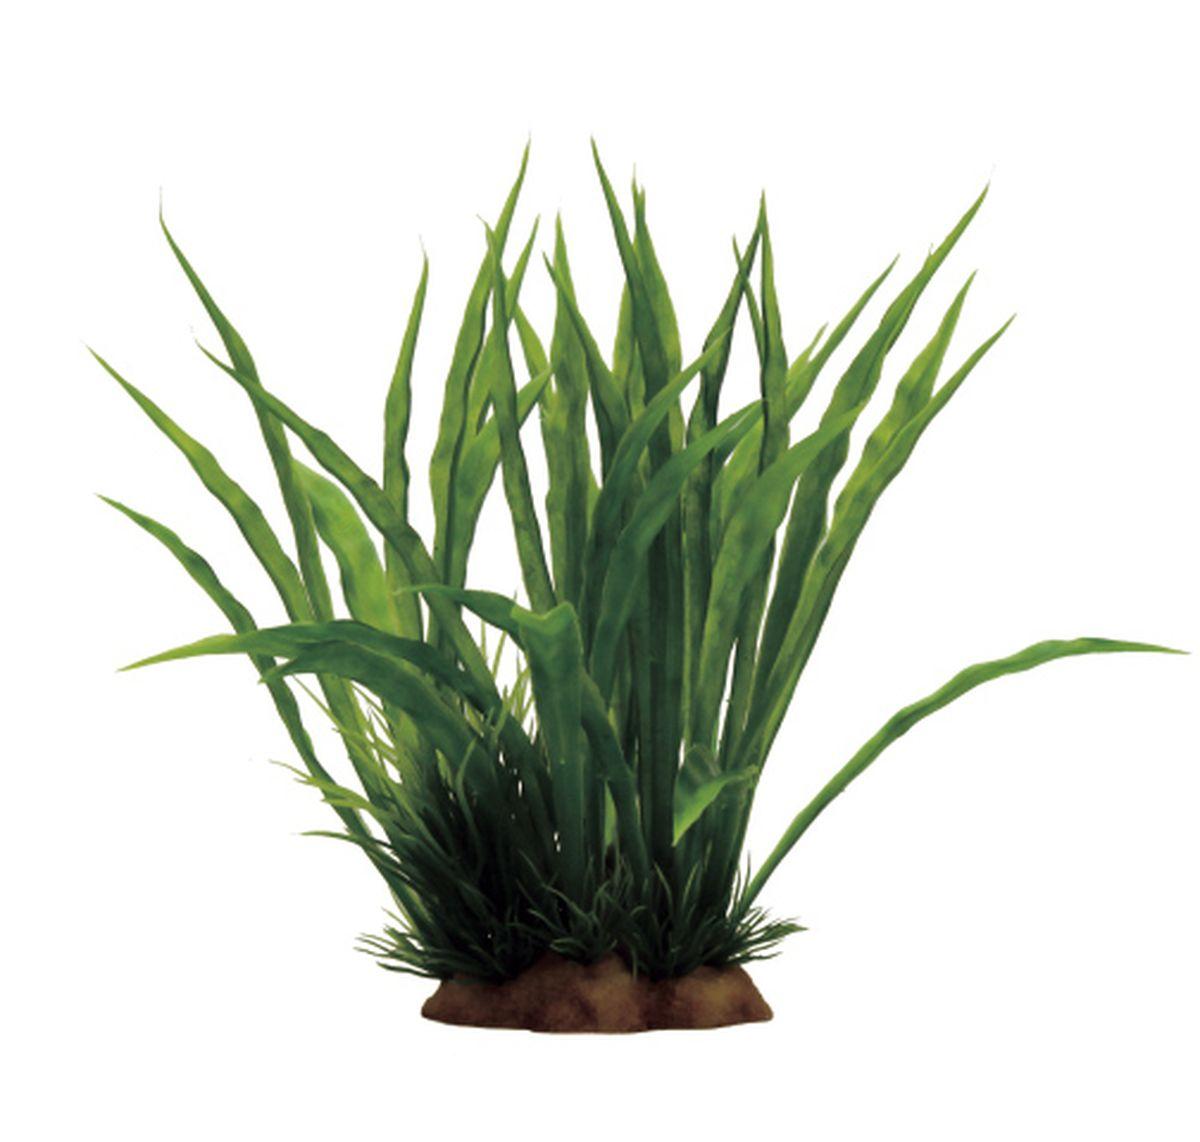 Растение для аквариума ArtUniq Криптокорина, 15 x 13 x 17 смART-1130902Растение для аквариума ArtUniq Криптокорина, 15 x 13 x 17 см